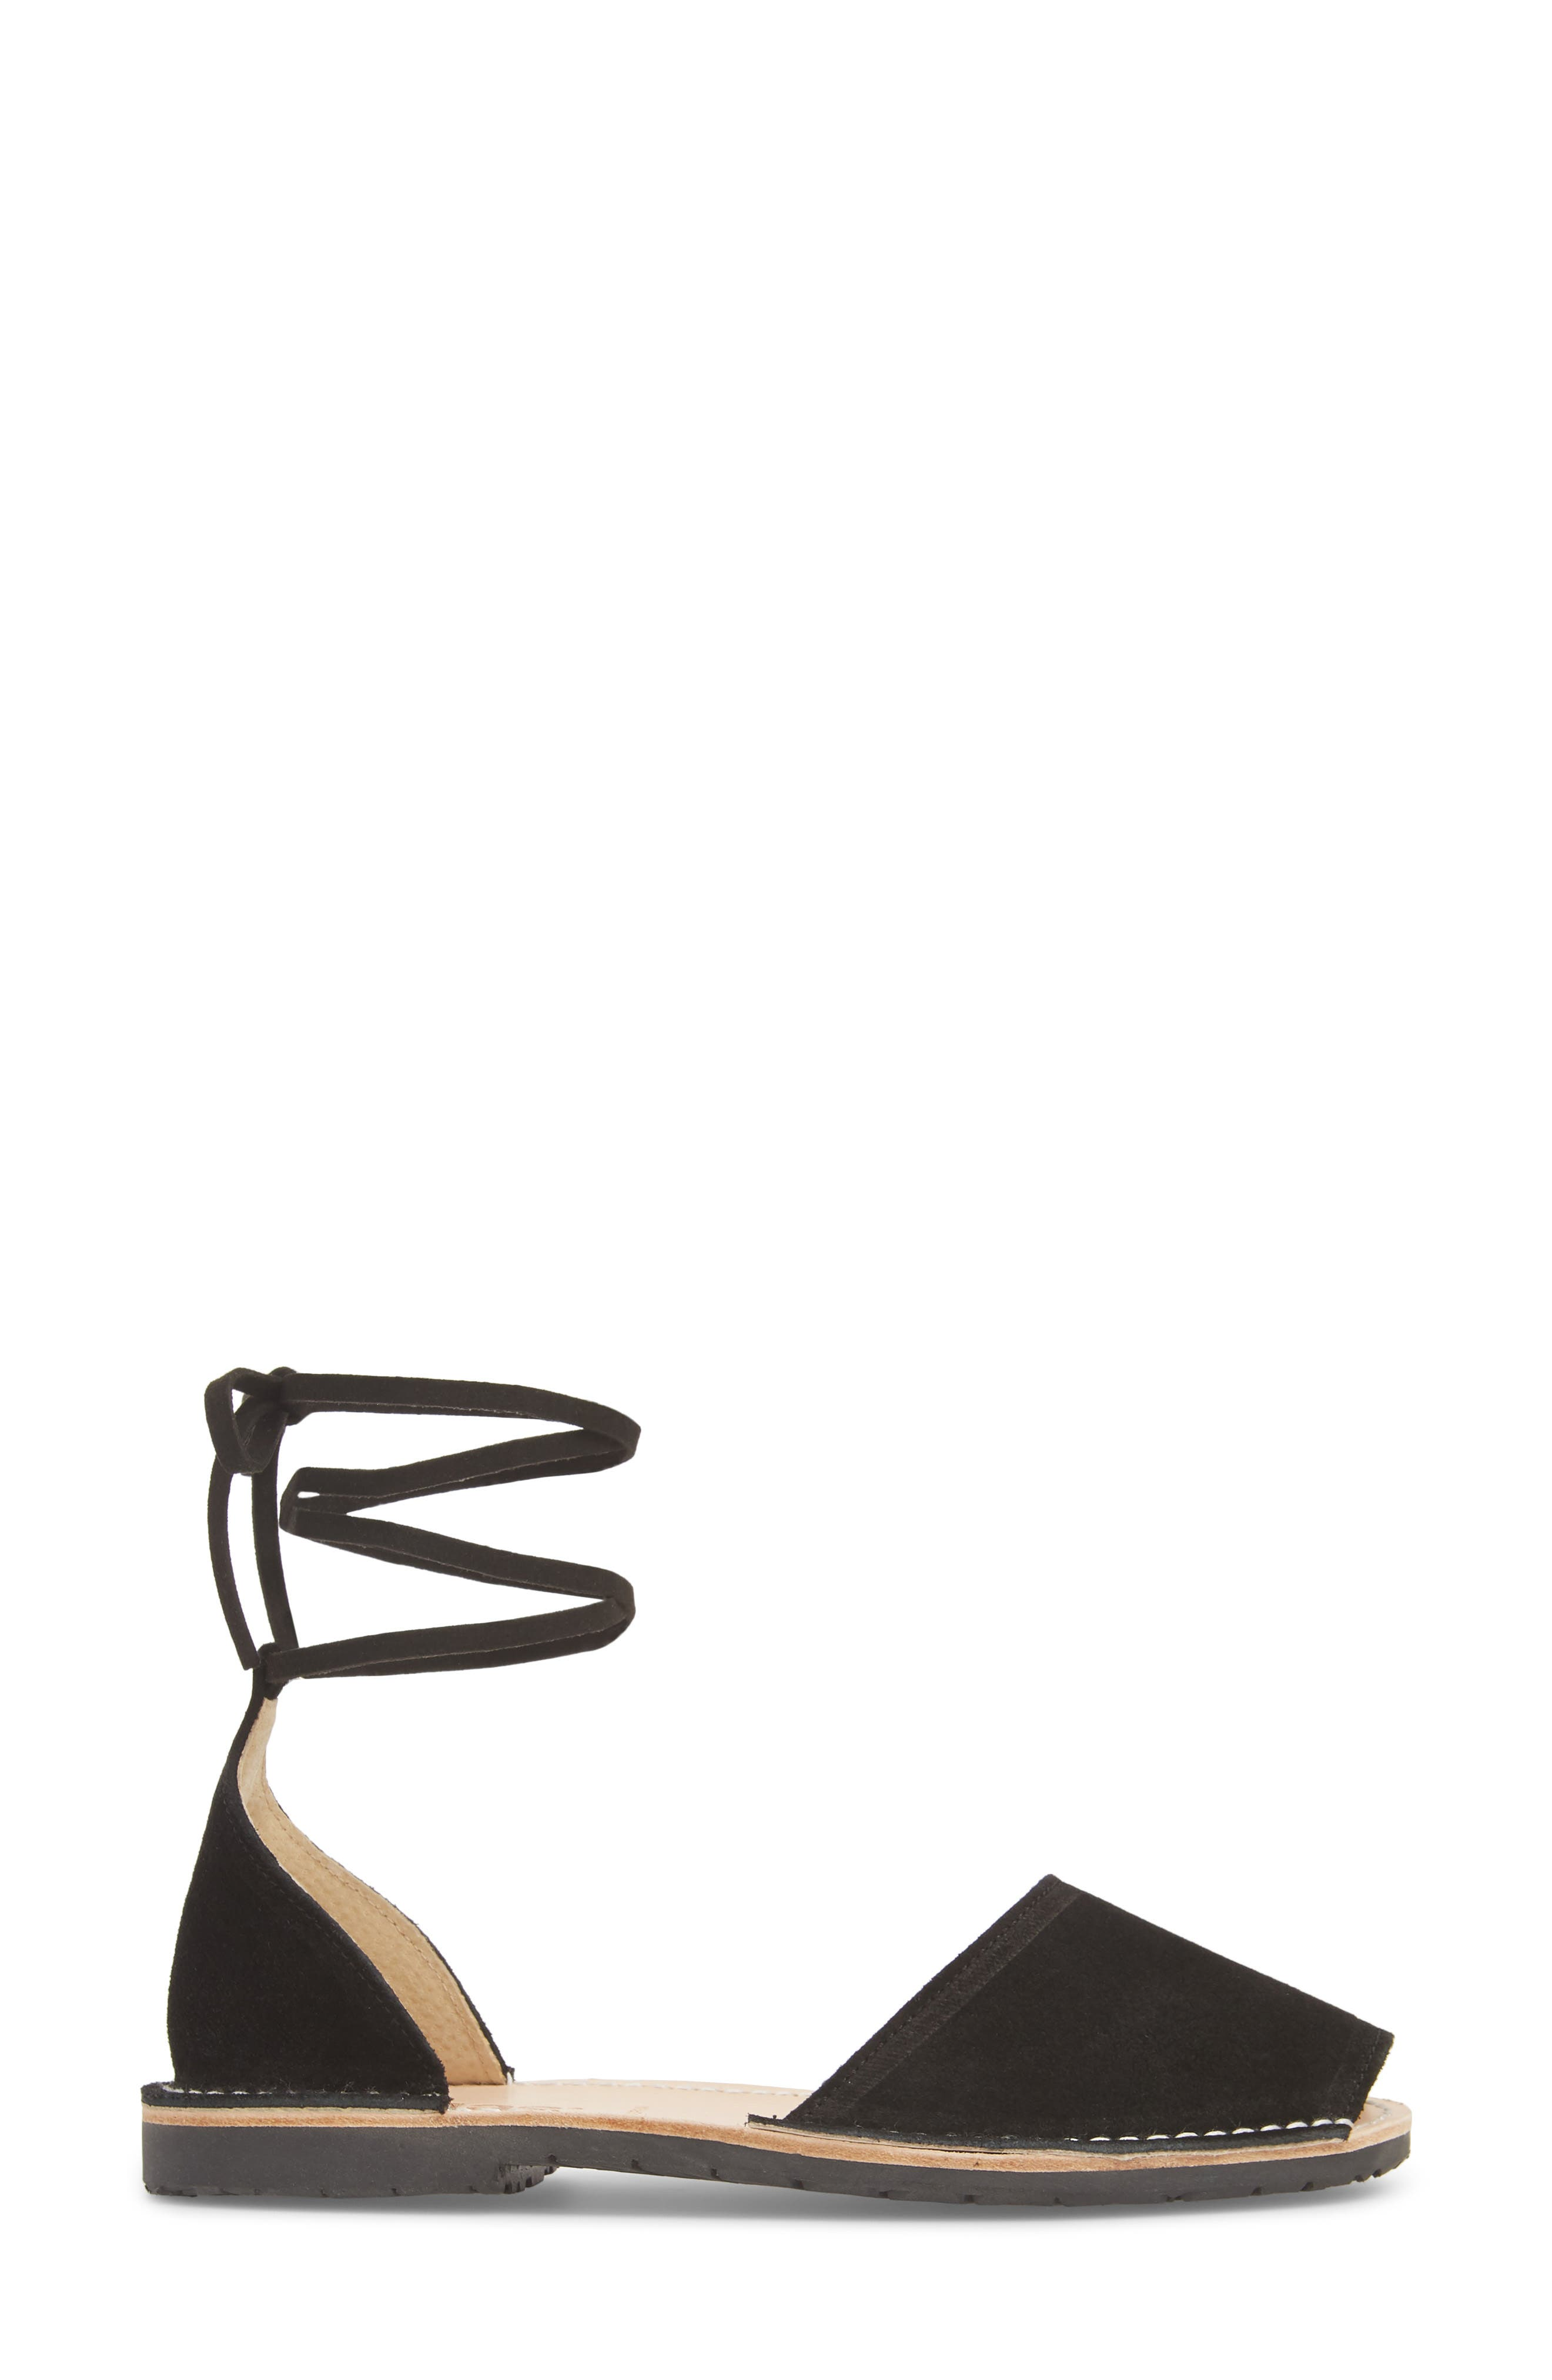 Ankle Tie Sandal,                             Alternate thumbnail 6, color,                             Black